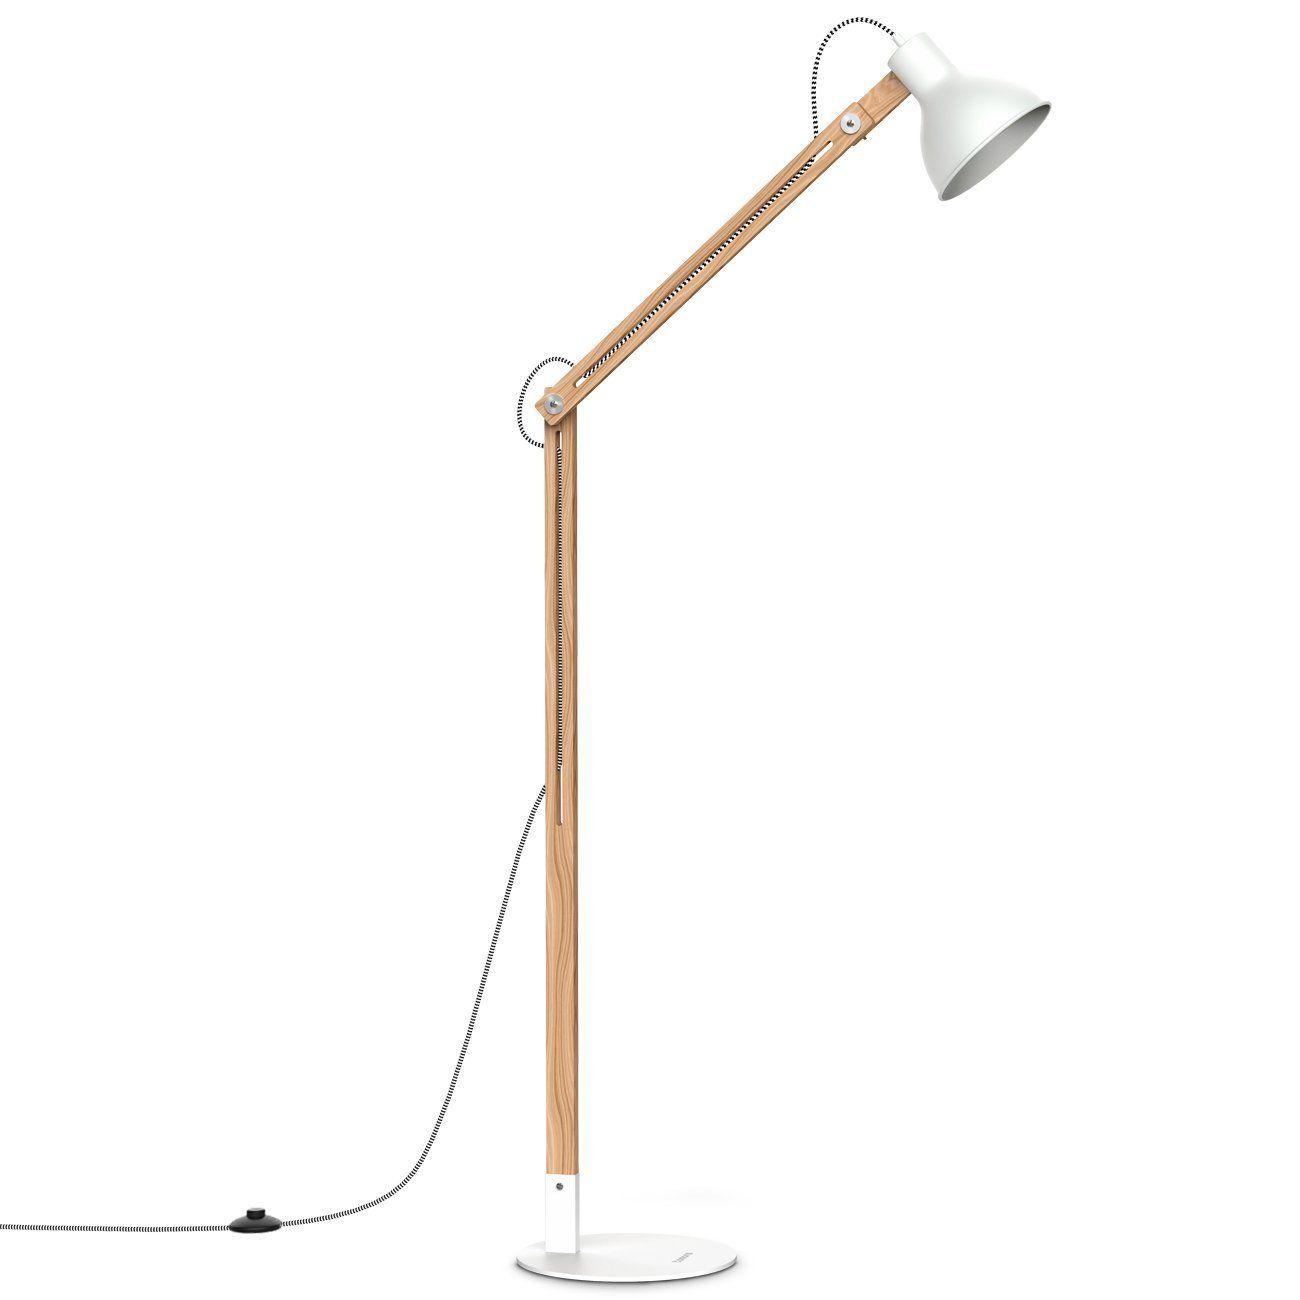 Tomons Wood Floor Lamp Adjustable Reading Light Nature Rubber Wood 8w Warm White Led Light Source 60w E26 27 Incandescent Lamp Lampe De Bureau Lampe Bois Reading floor lamps adjustable